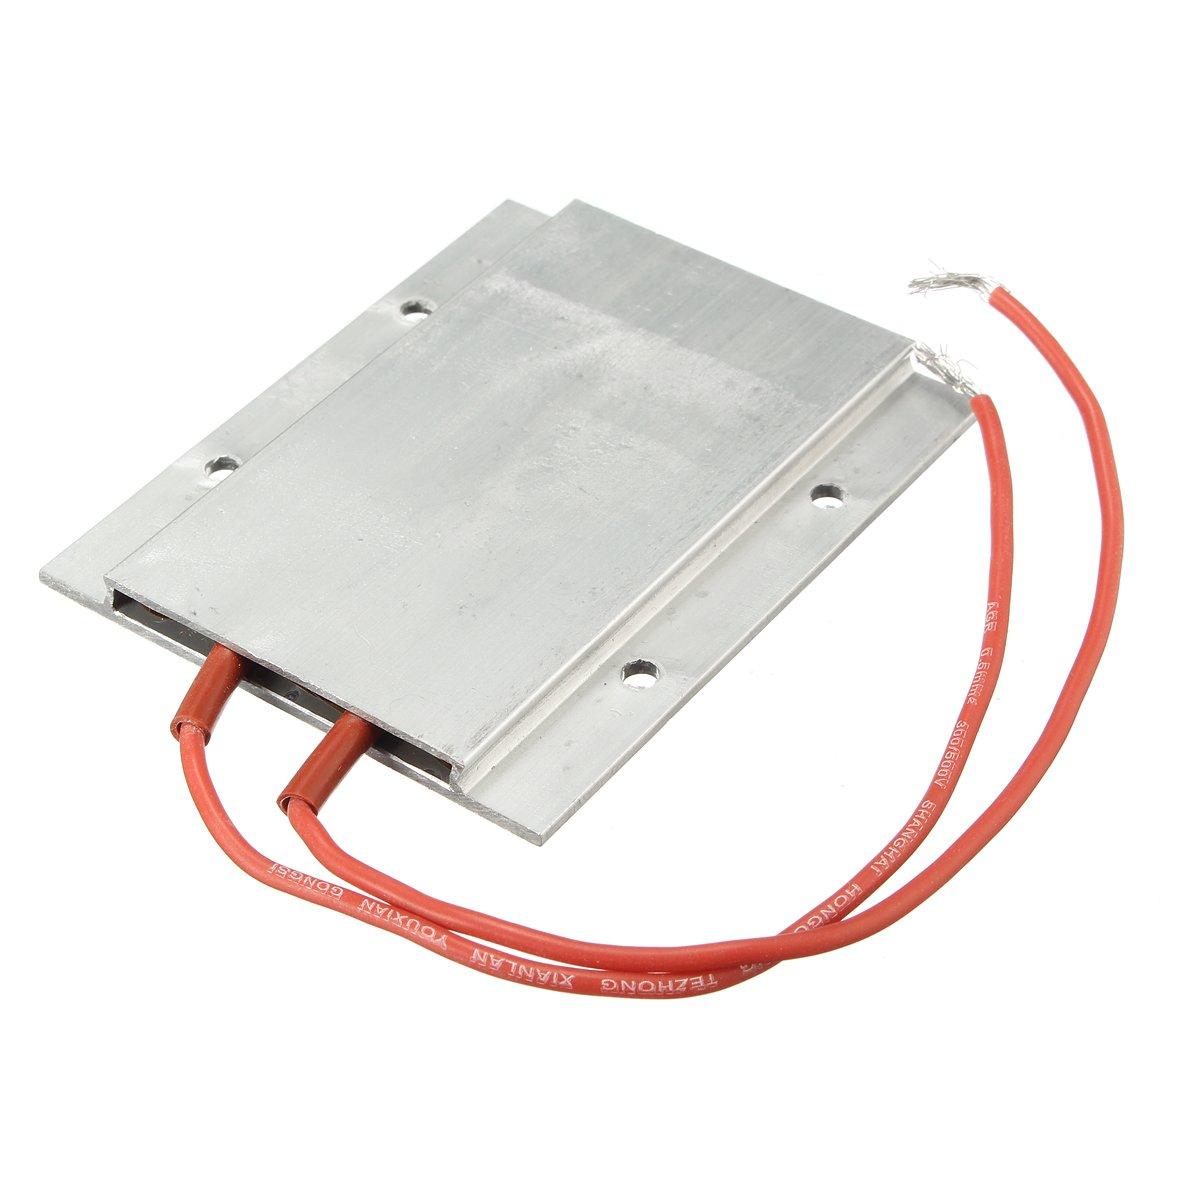 UL 200W AC / DC 220V 77 x 62 x 6mm PTC Thermostat Aluminum Heating Ceramic Heater Incubator Dehumidification